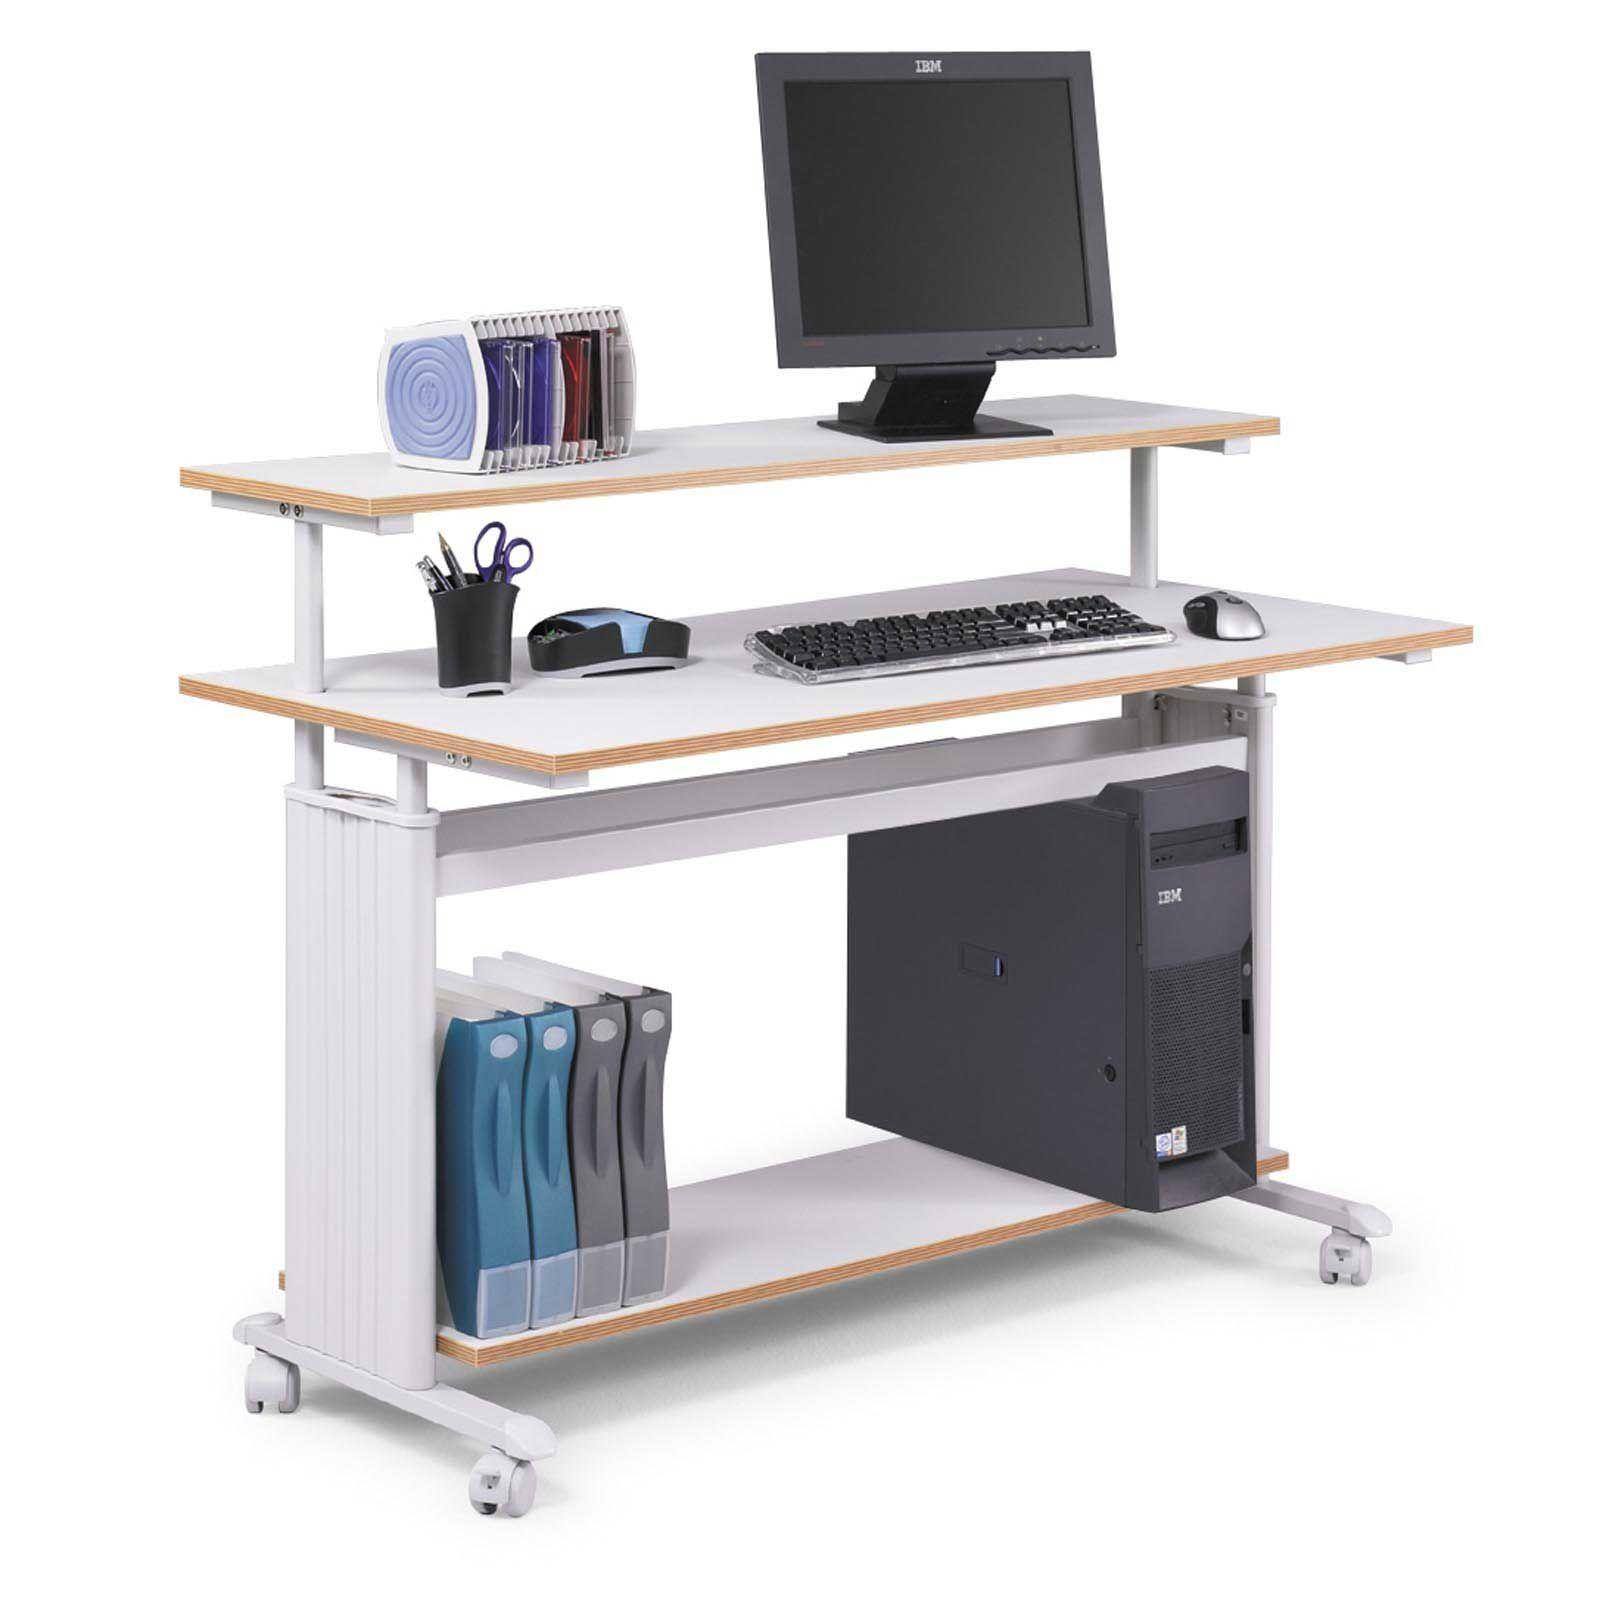 Ikea Computer Desk Design Best Home Office Desk Built In